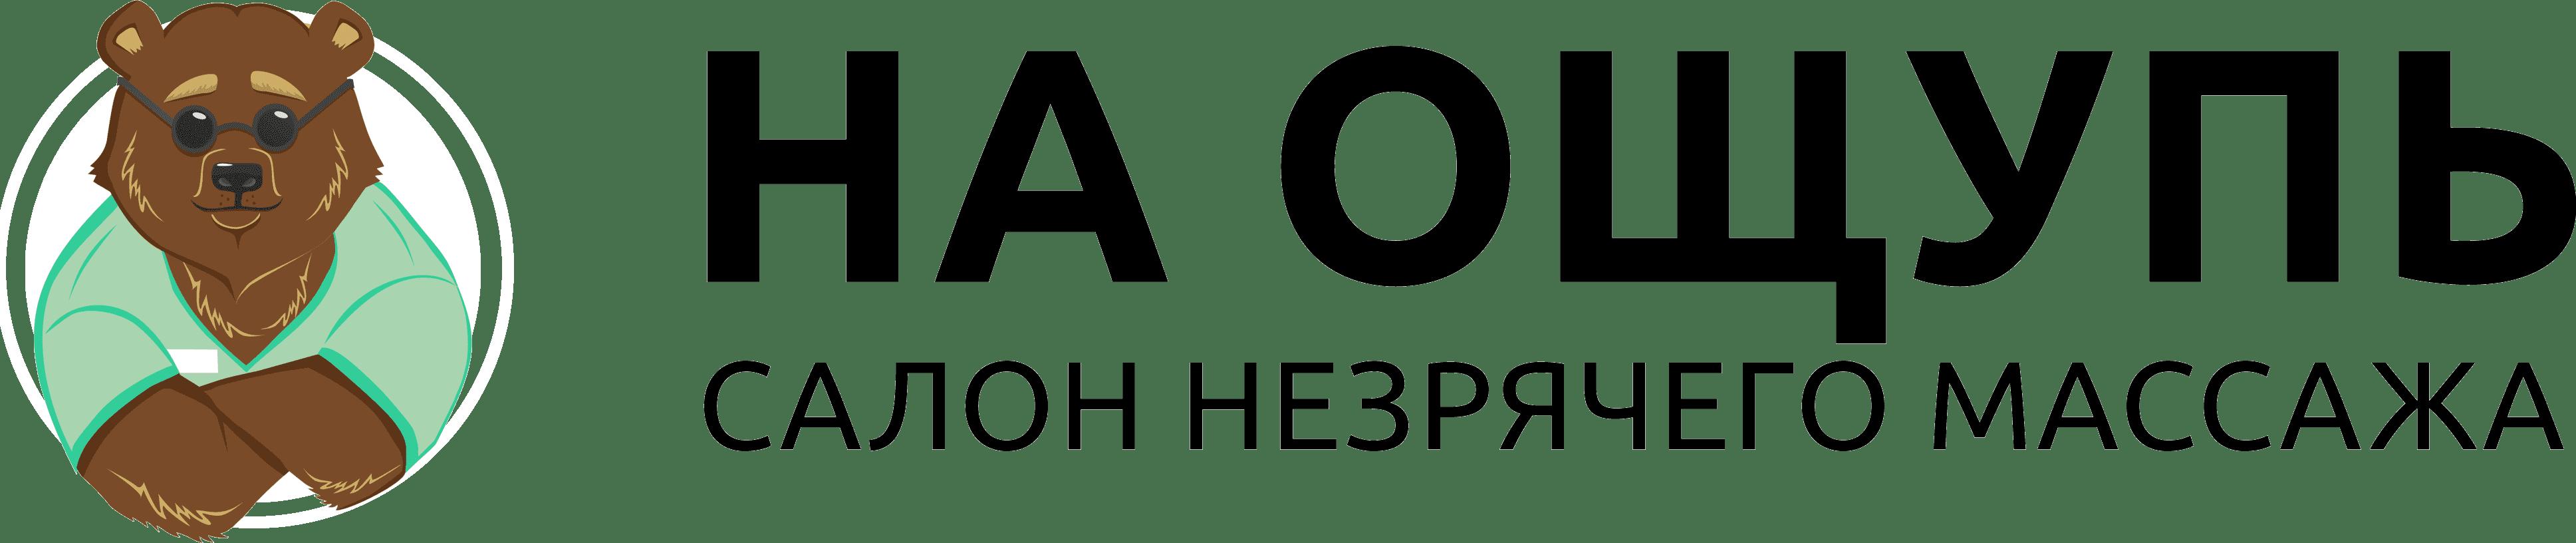 Салон слепого массажа в Томске